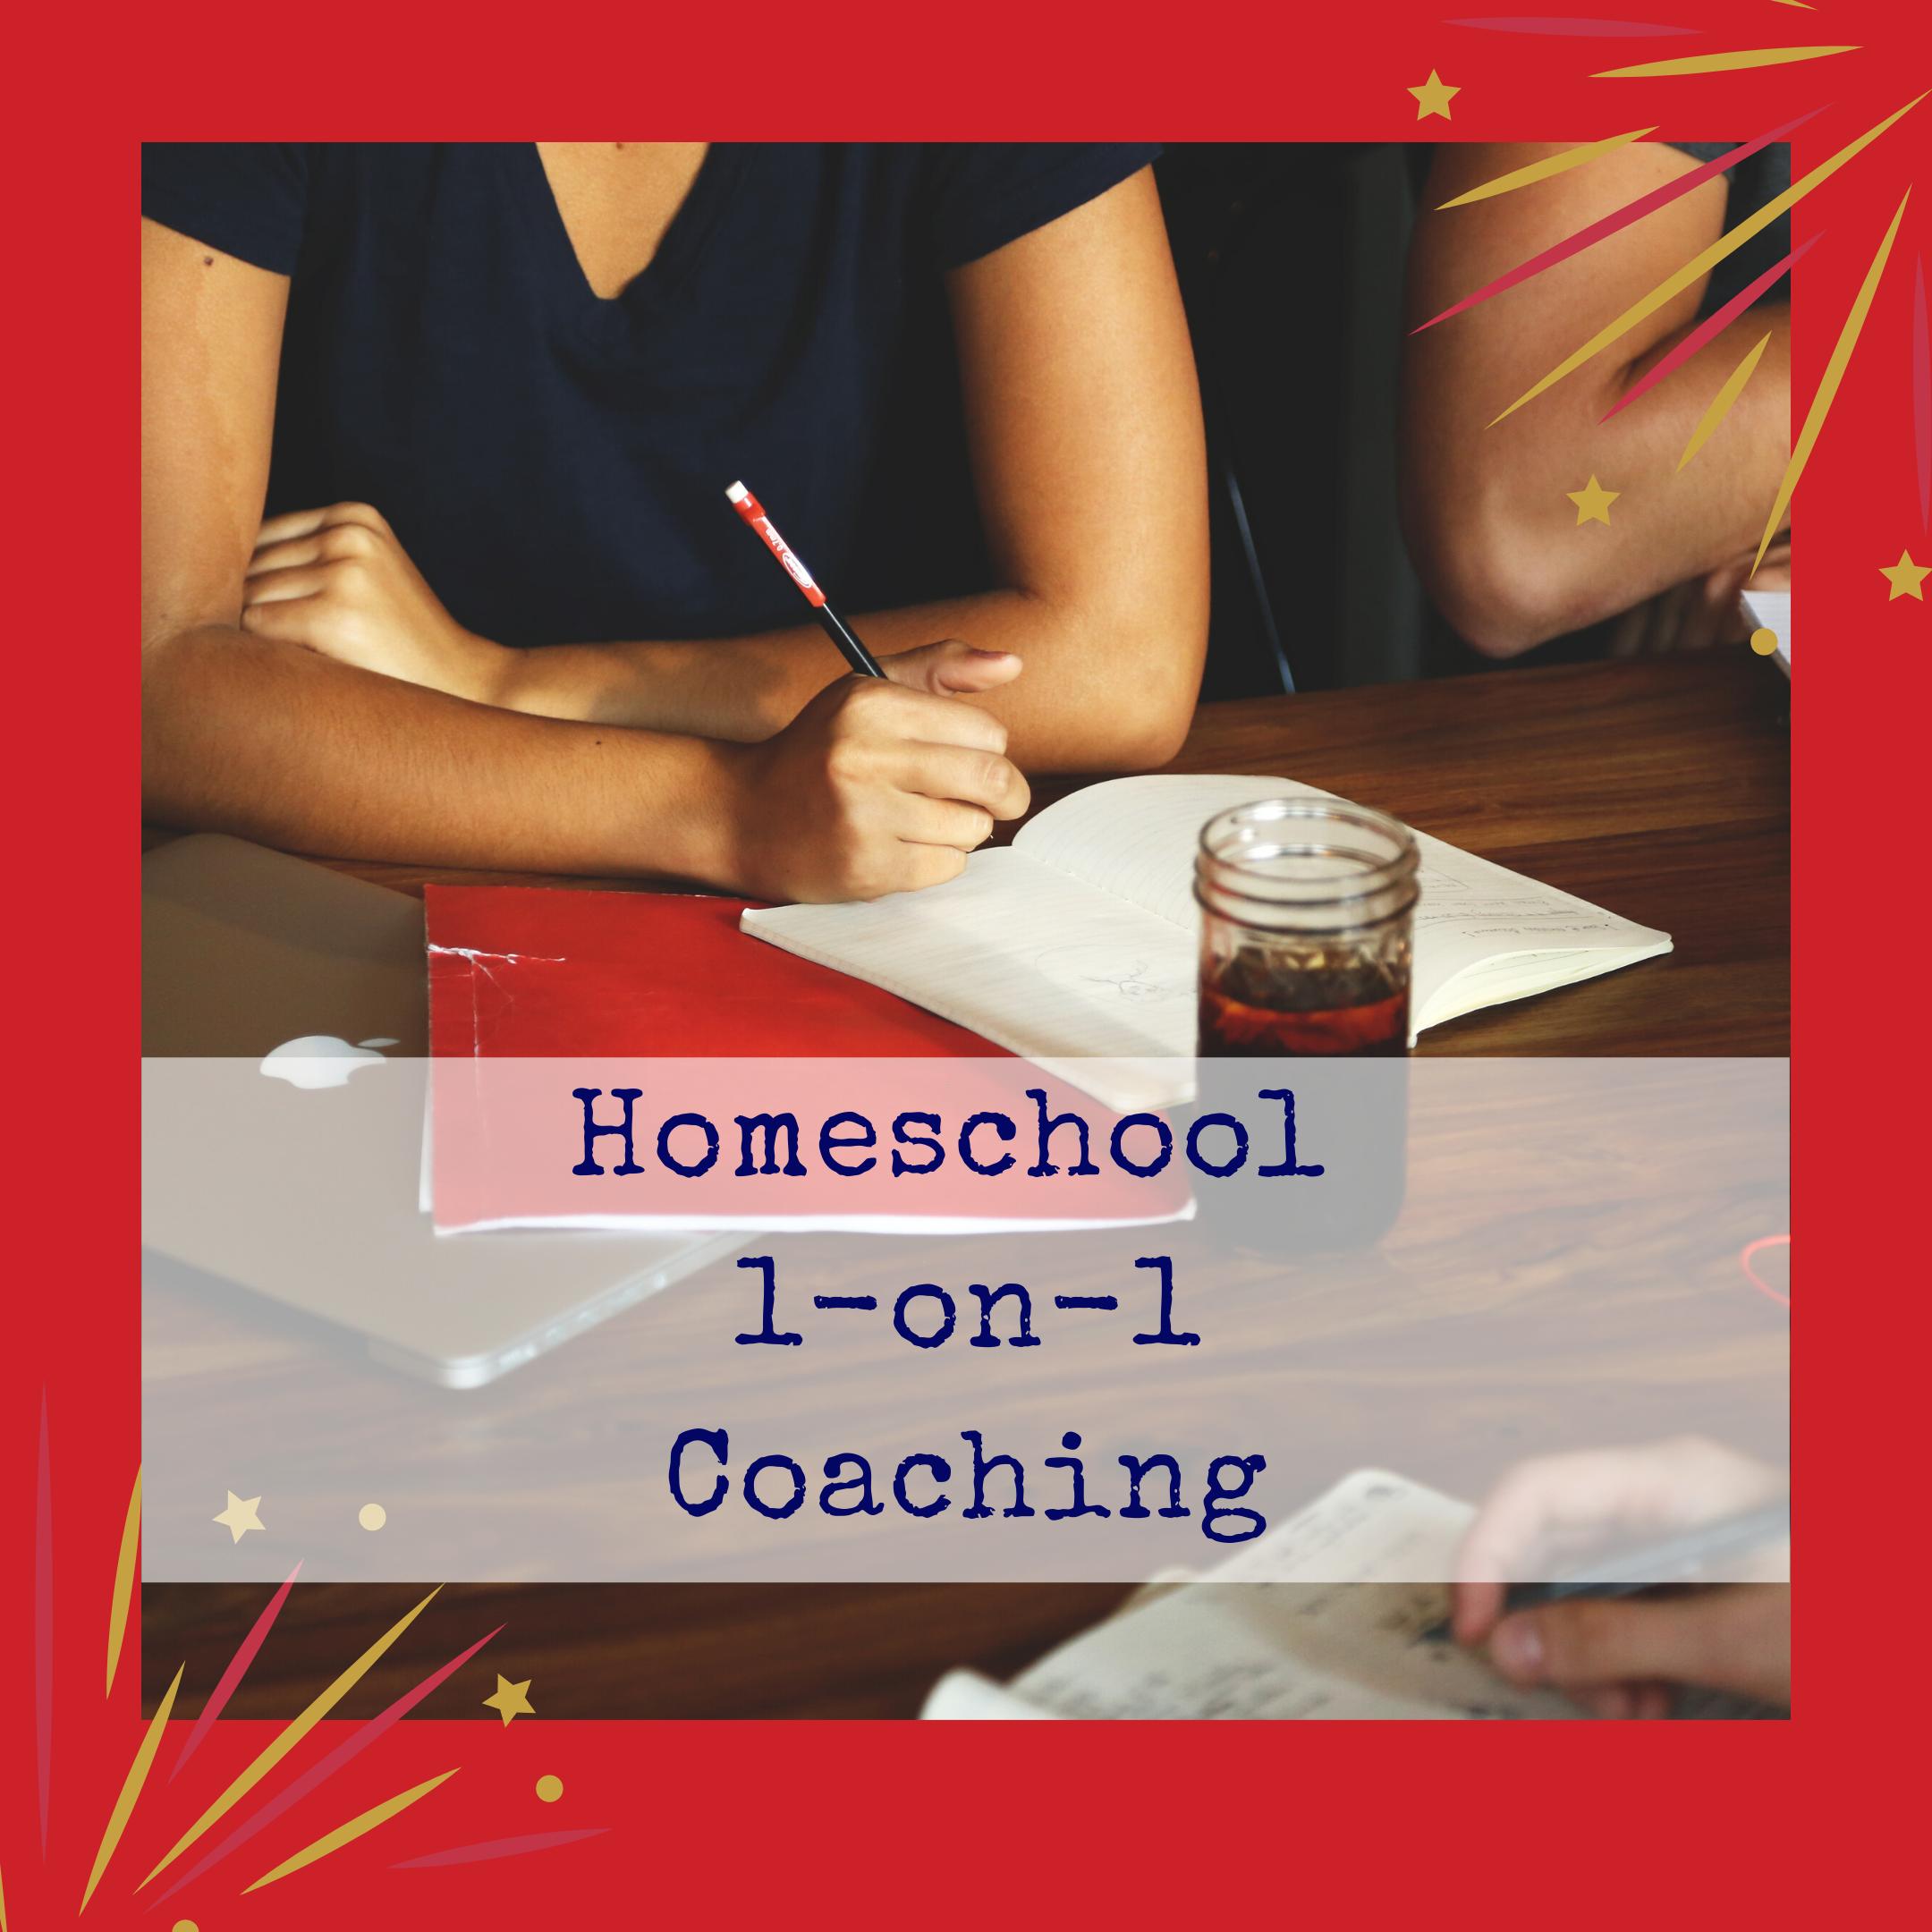 Homeschool 1-on-1 Coaching